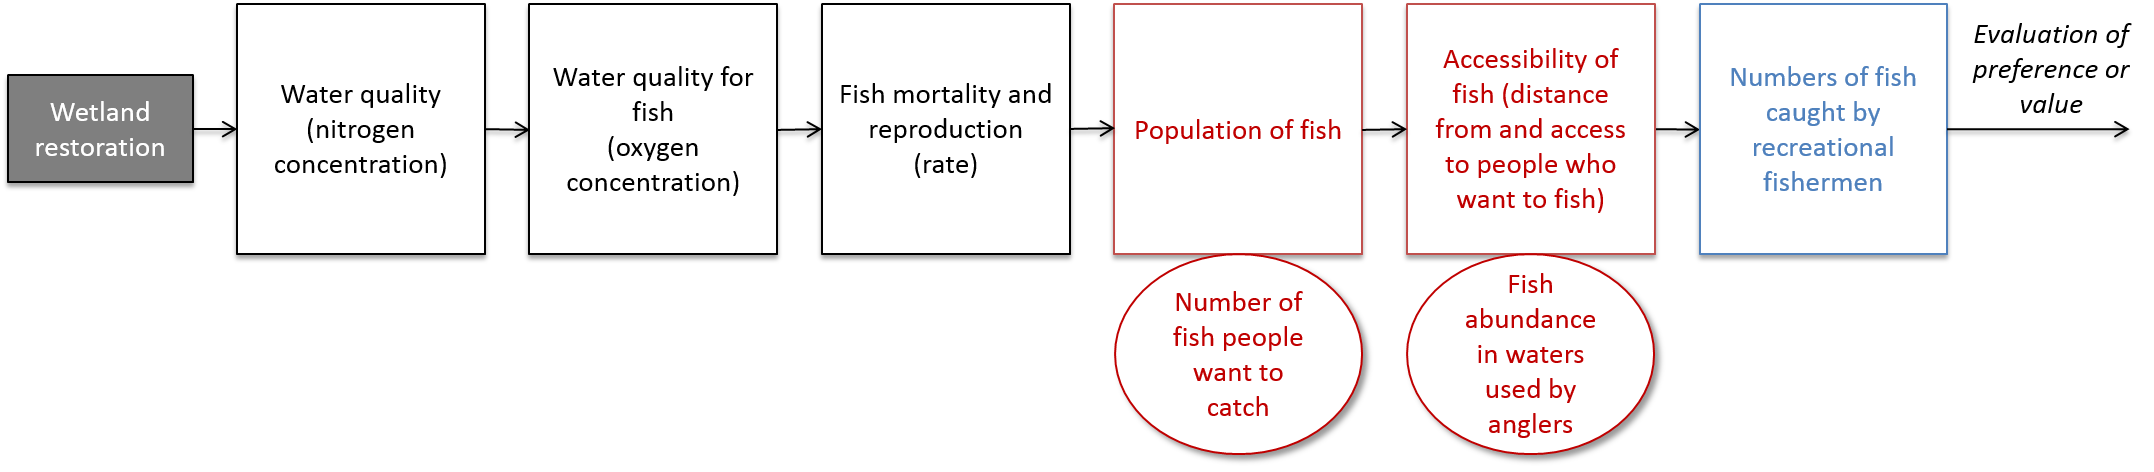 Fig7_QuantifyingBRIs_WetlandRestorationBenefits